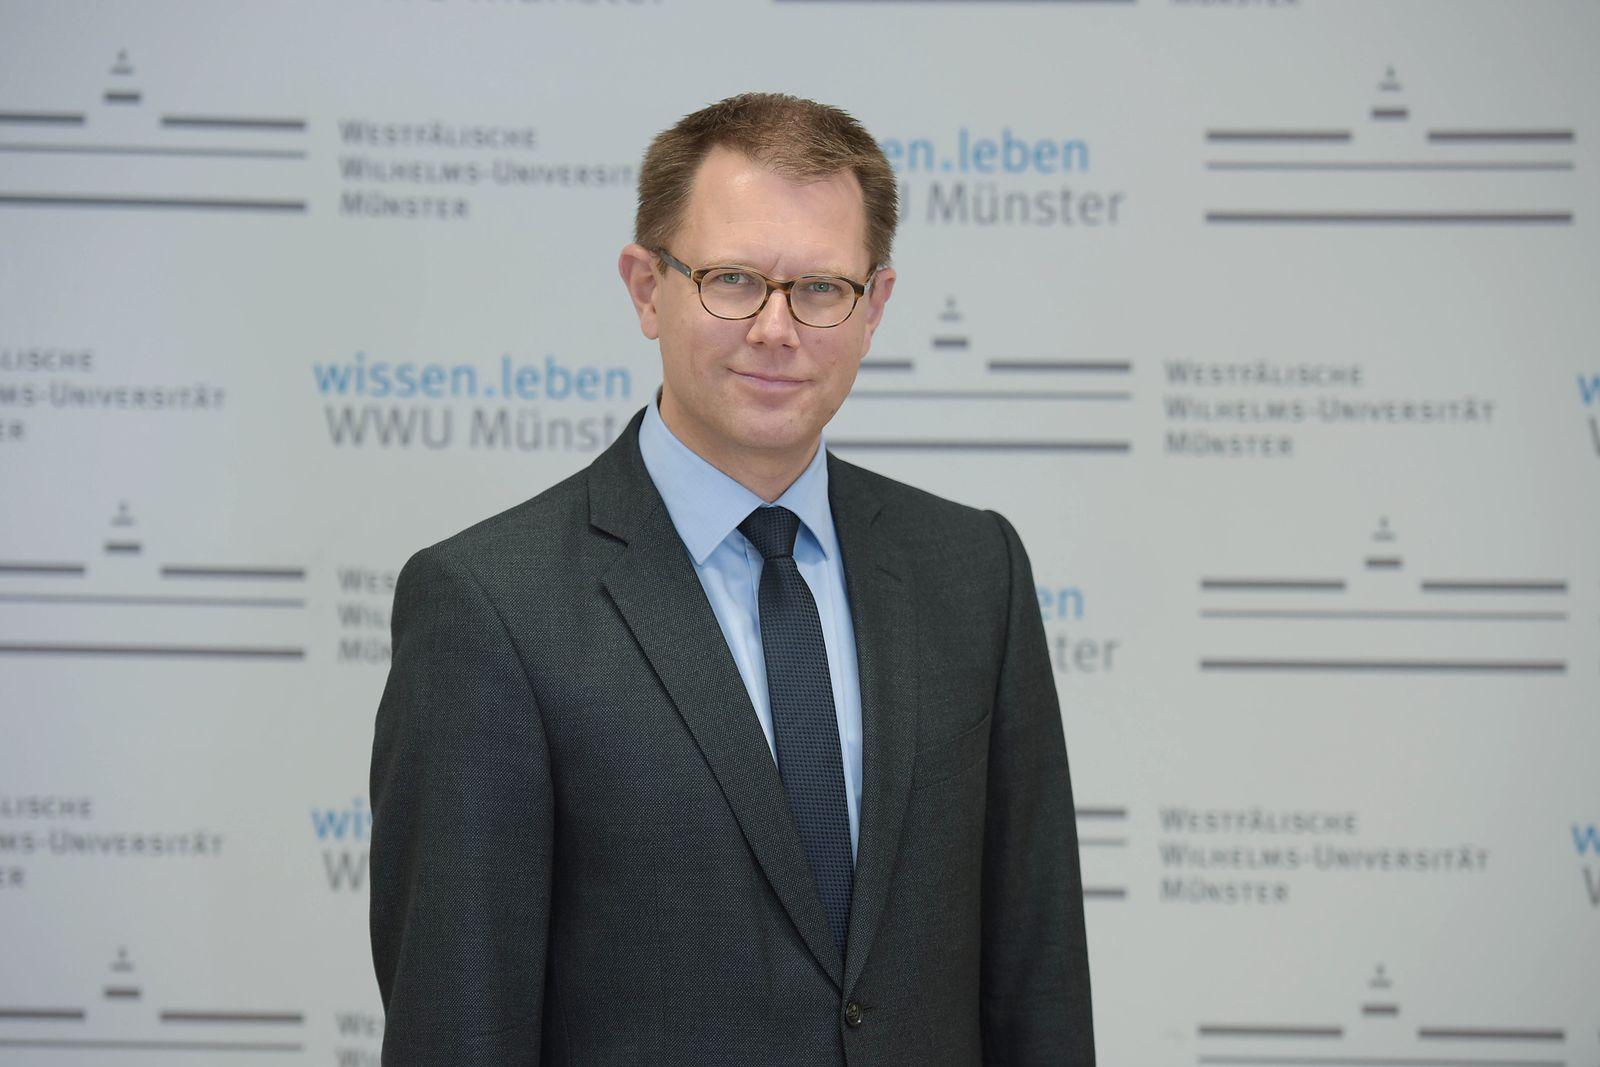 Bild Wißmann WWU 2016[2]